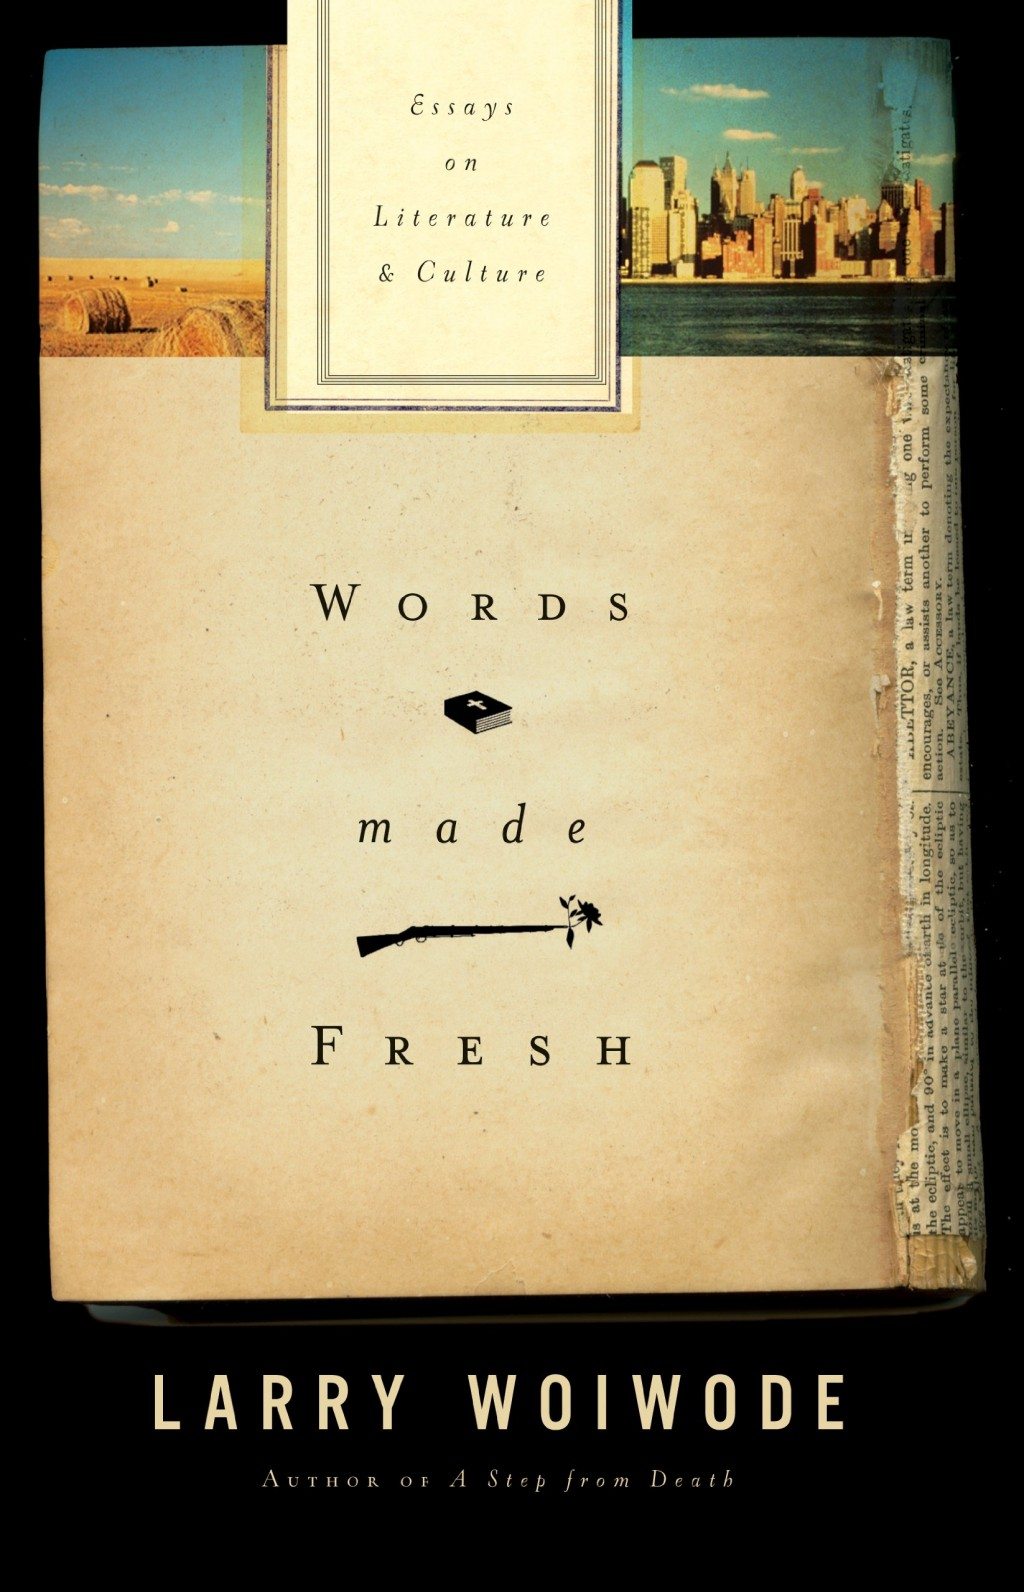 007 812bum Ji26l Fresh Essays Essay Wondrous Contact Customer Service Number Large